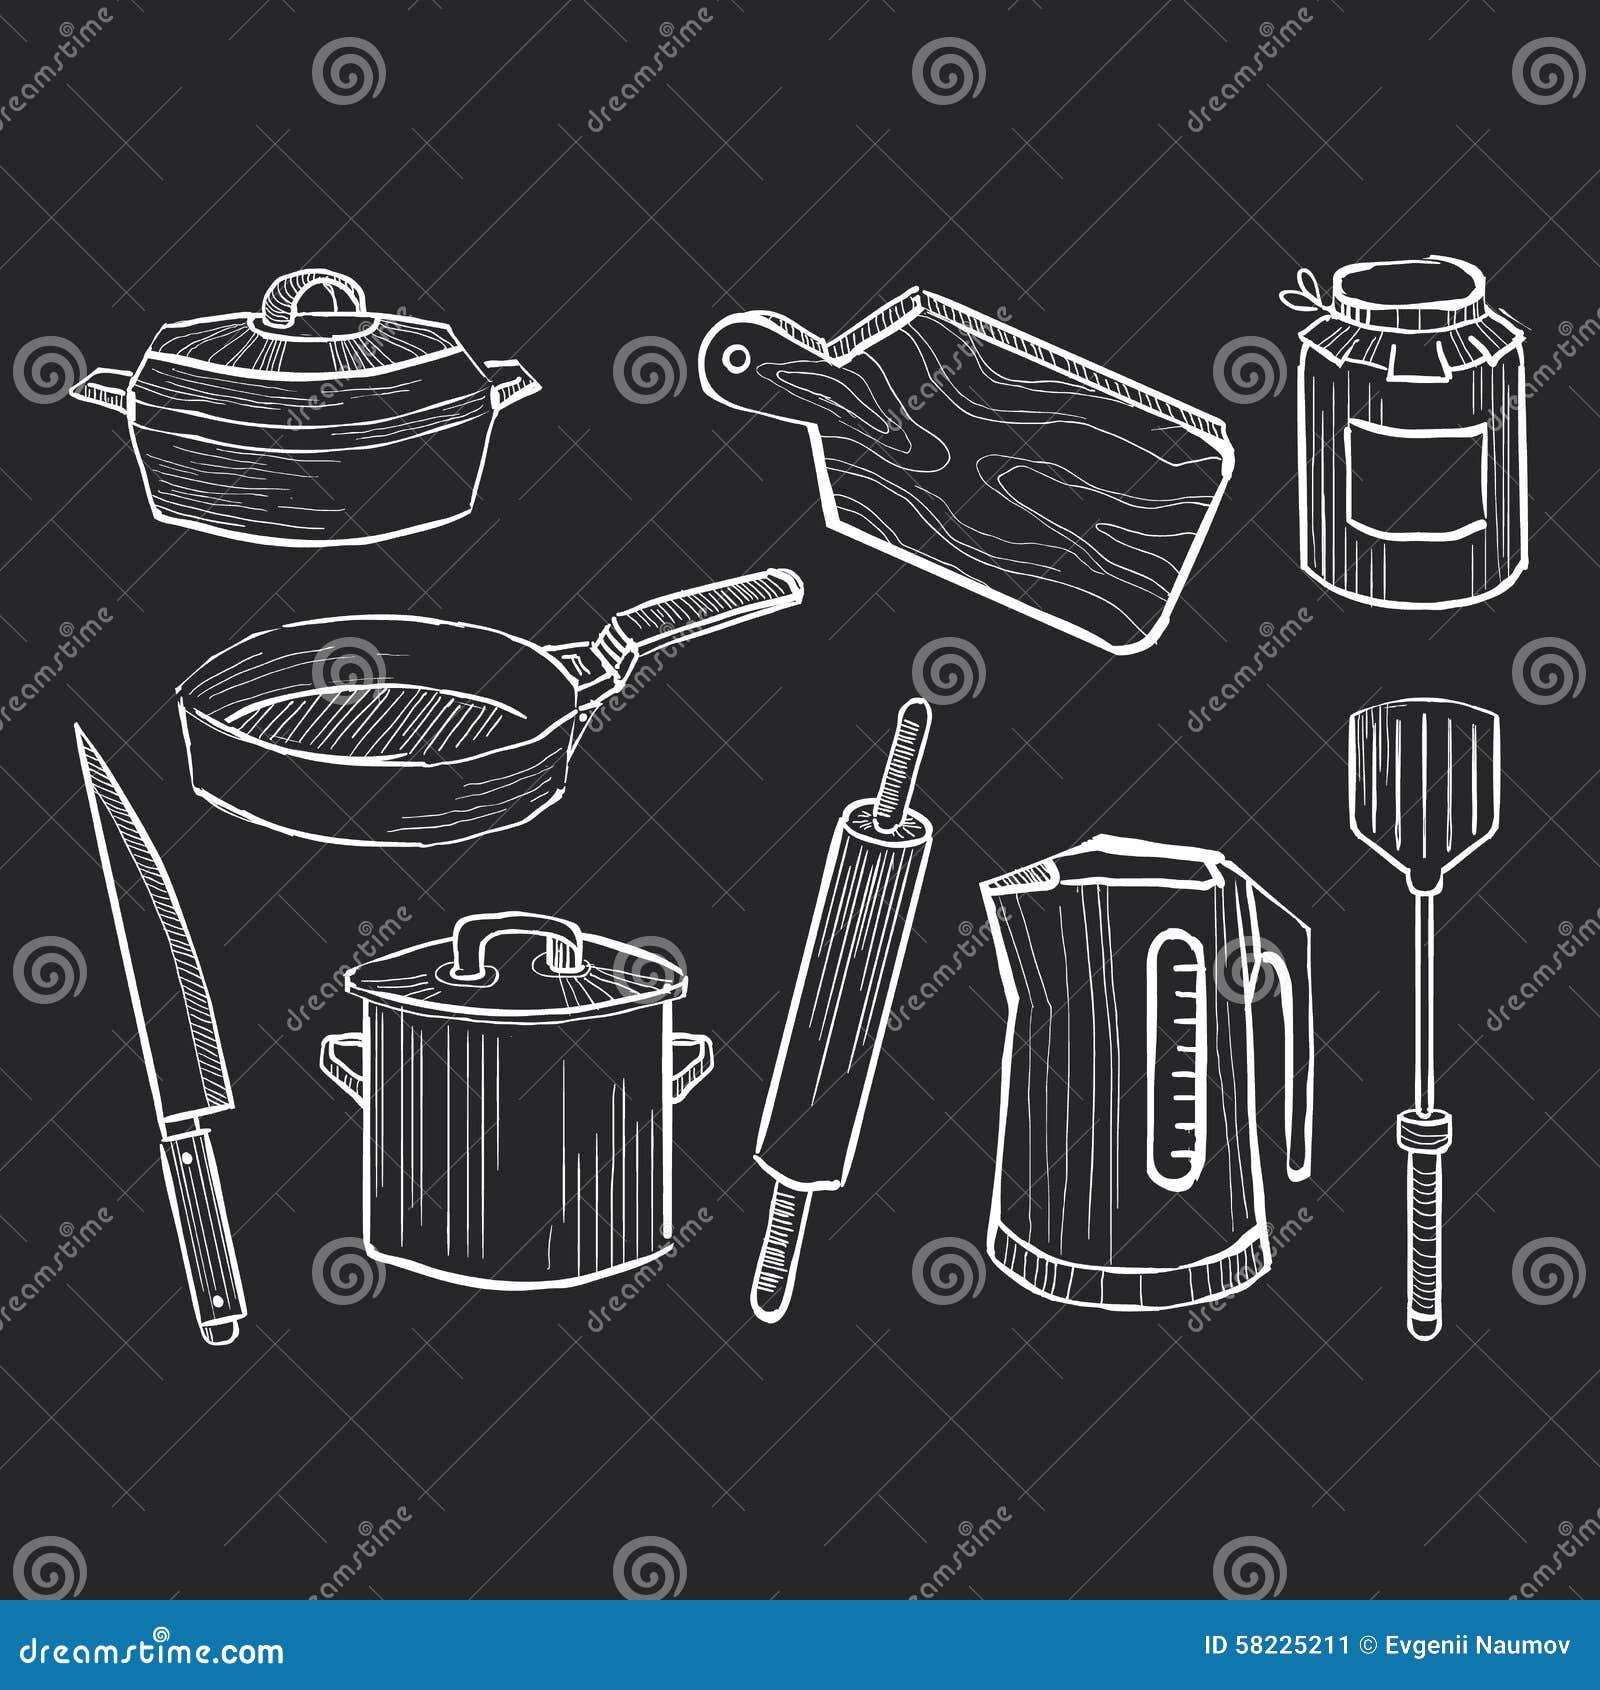 Chalkboard Kitchen Hand Drawn Set Of Kitchen Utensils On A Chalkboard Stock Vector